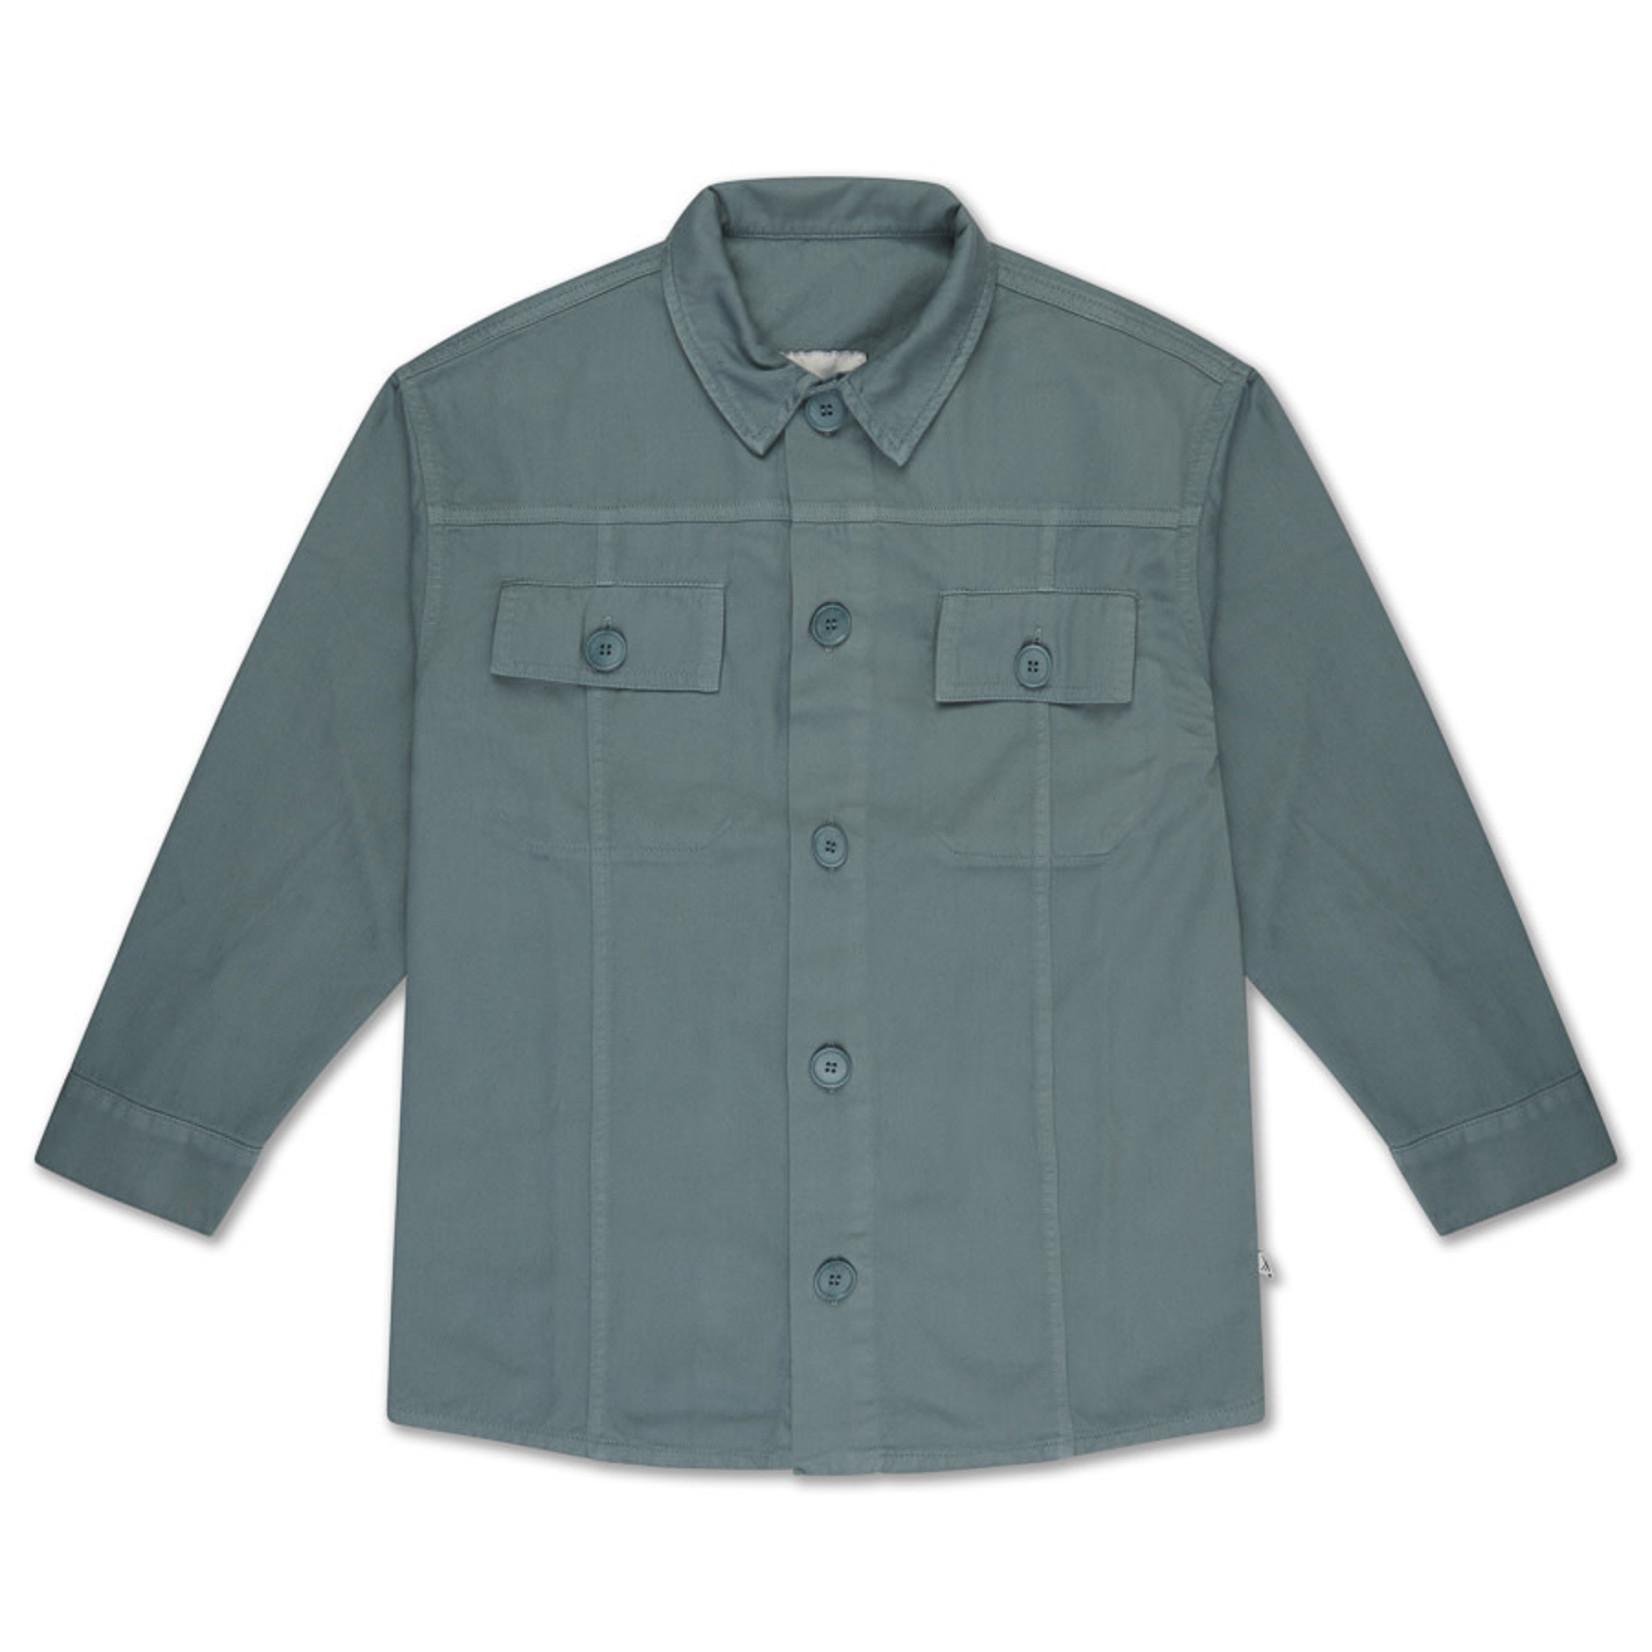 REPOSE AMS REPOSE shirt-jack